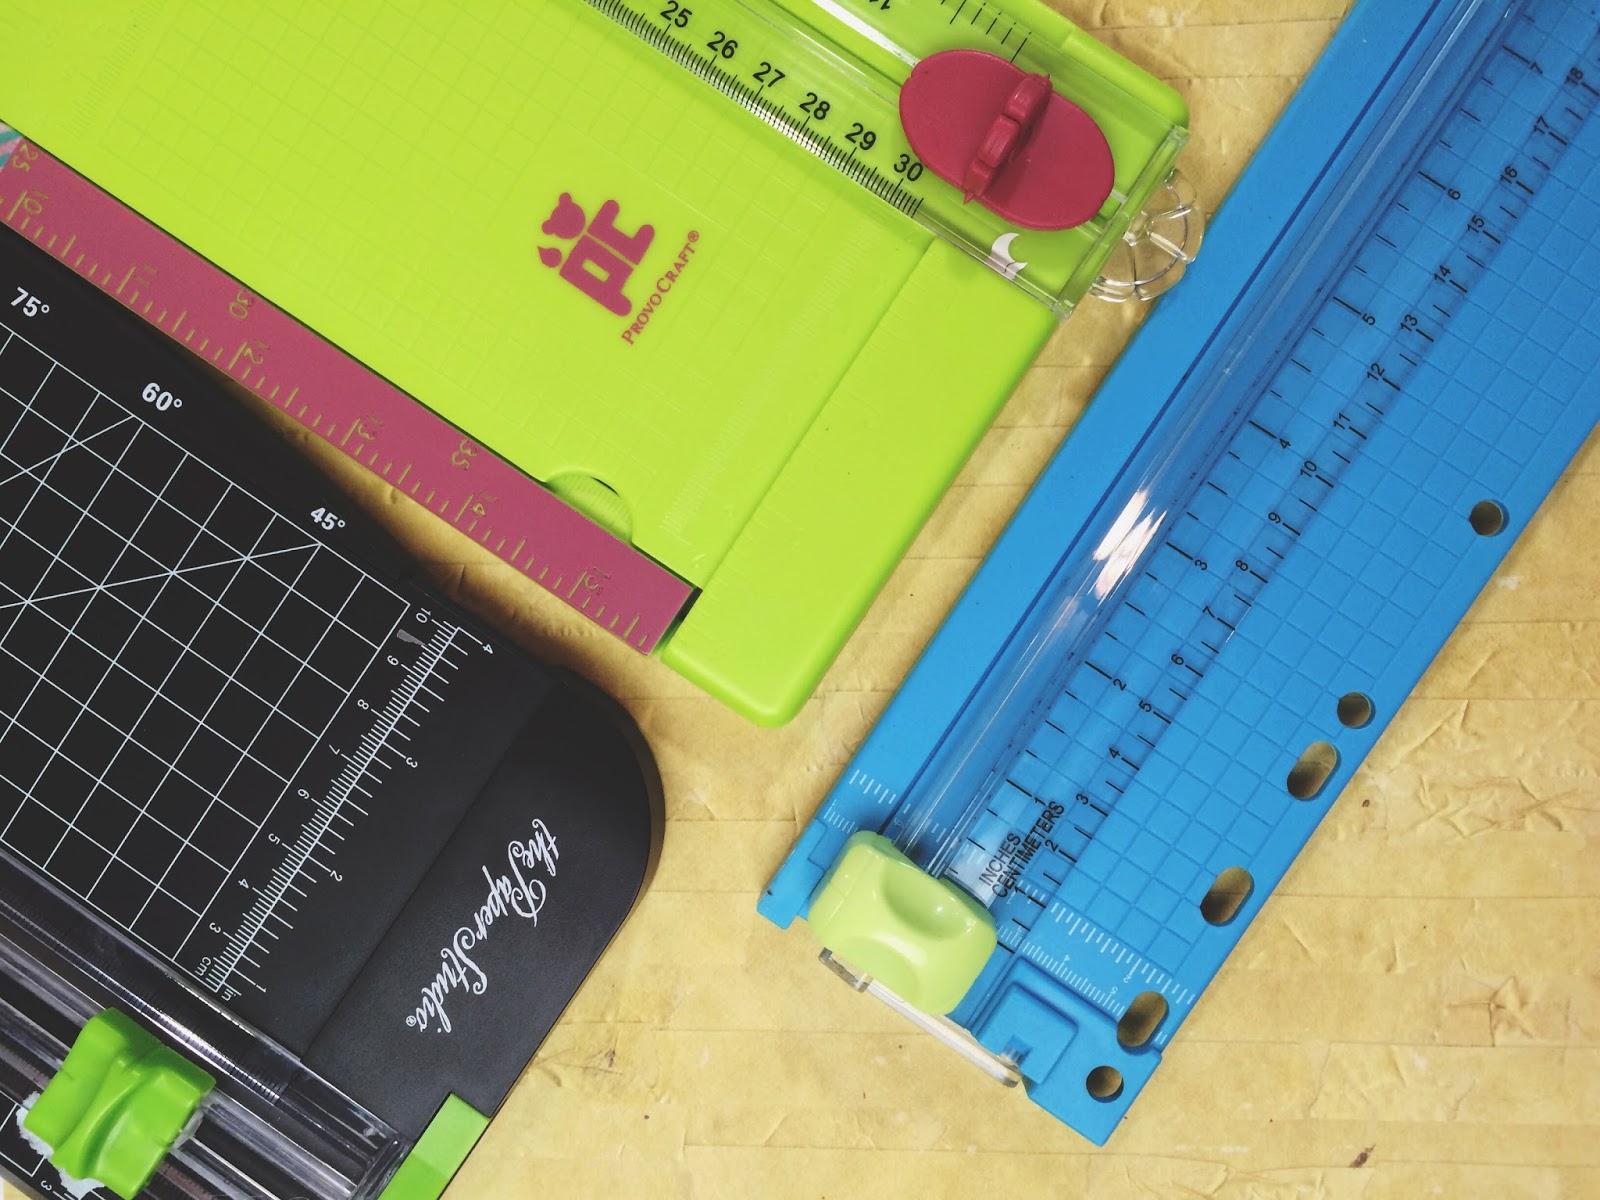 Five sixteenths blog top three paper crafting favorites